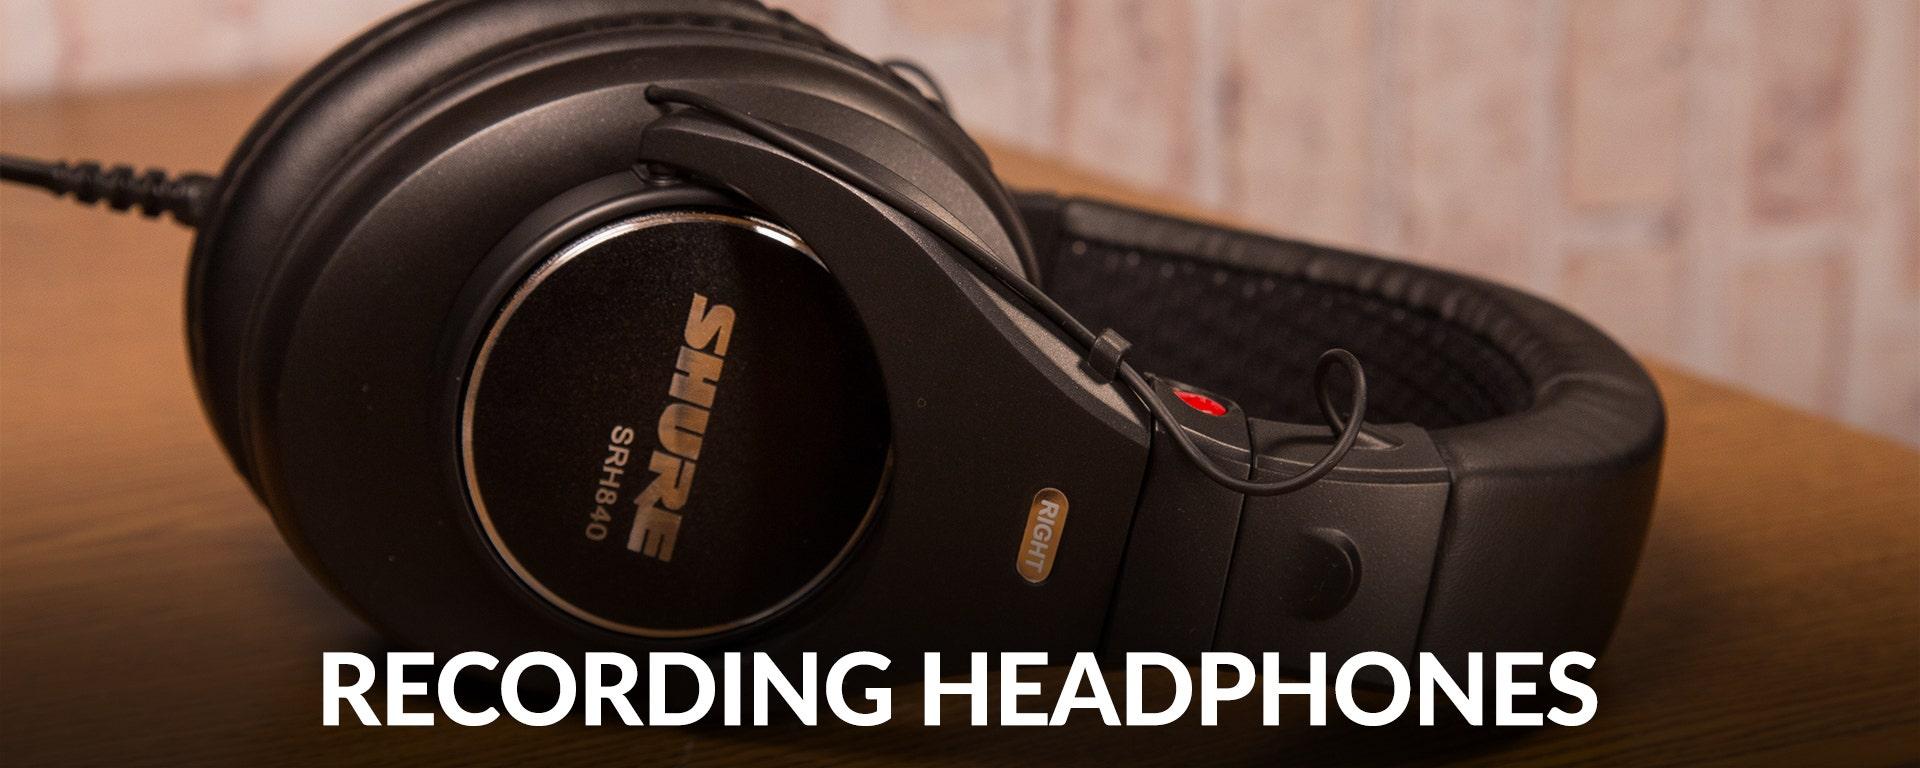 Shop Recording Headphones at SamAsh.com